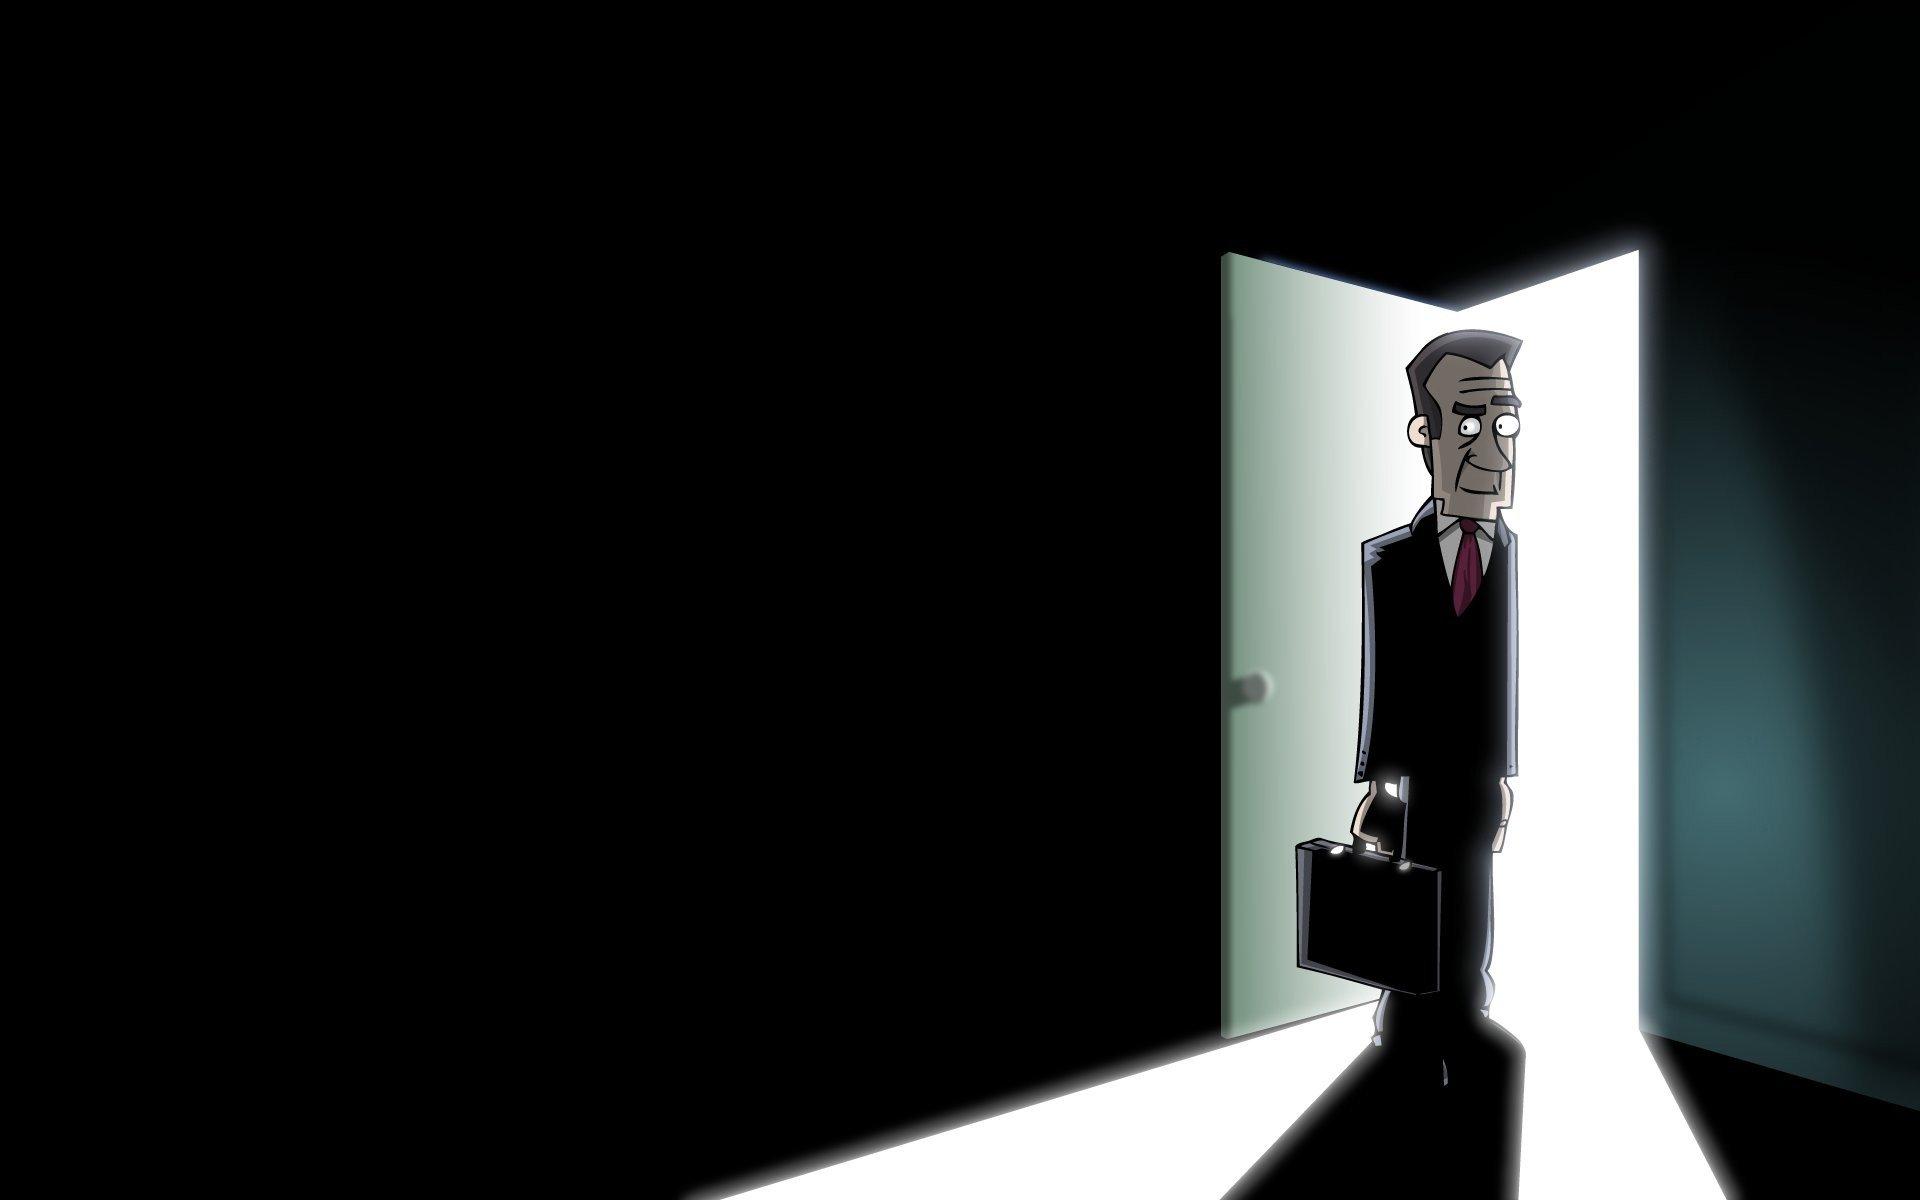 Half Life Iphone Wallpaper: Half-Life Full HD Wallpaper And Background